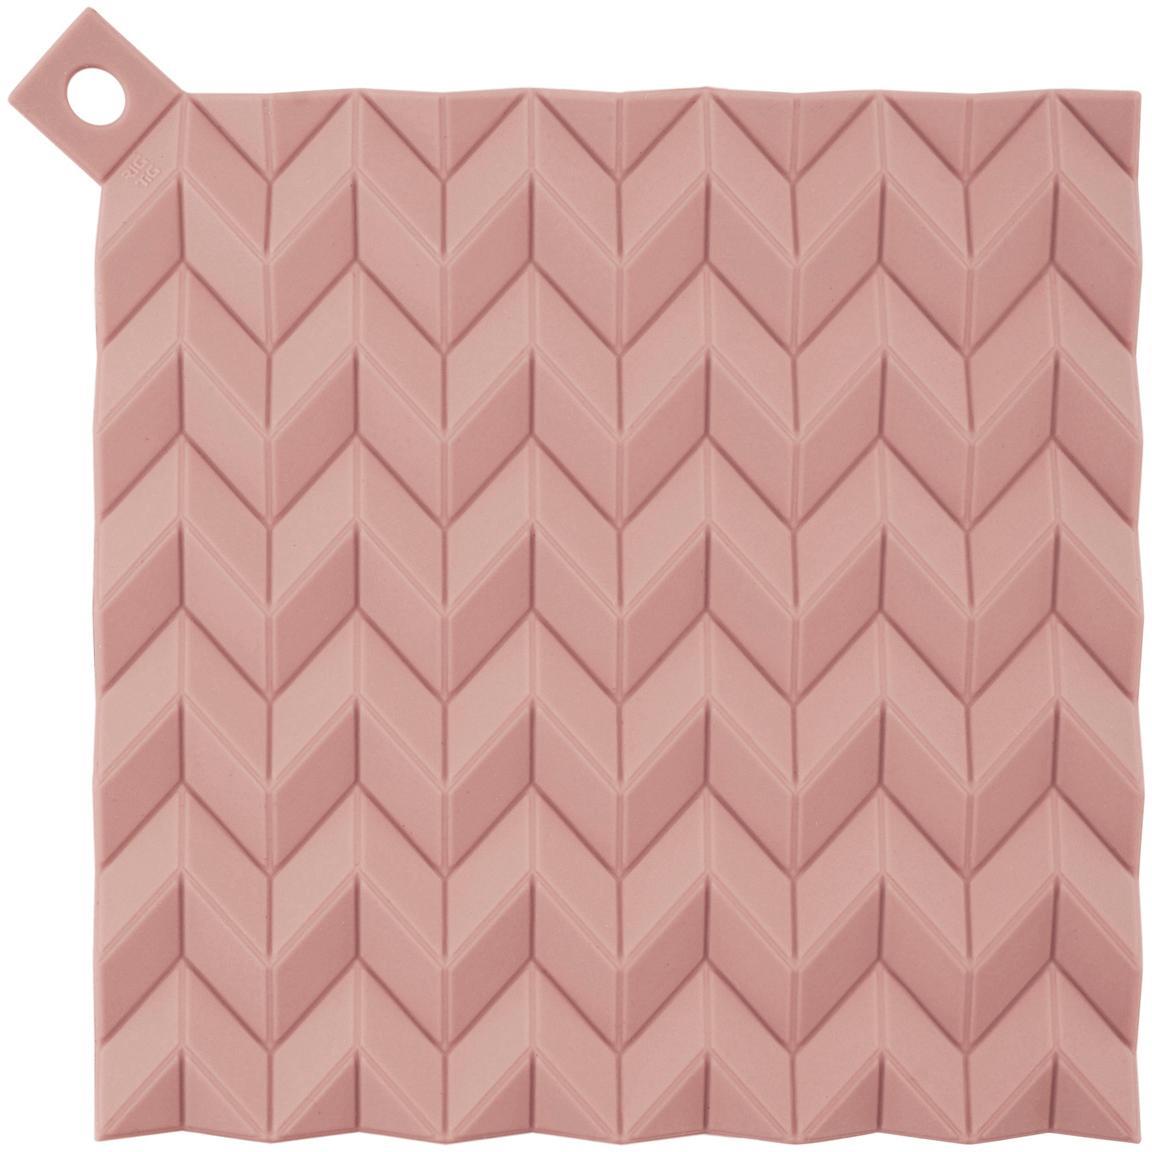 Pannenlappen Hold On, 2 stuks, Siliconen, Roze, 21 x 21 cm